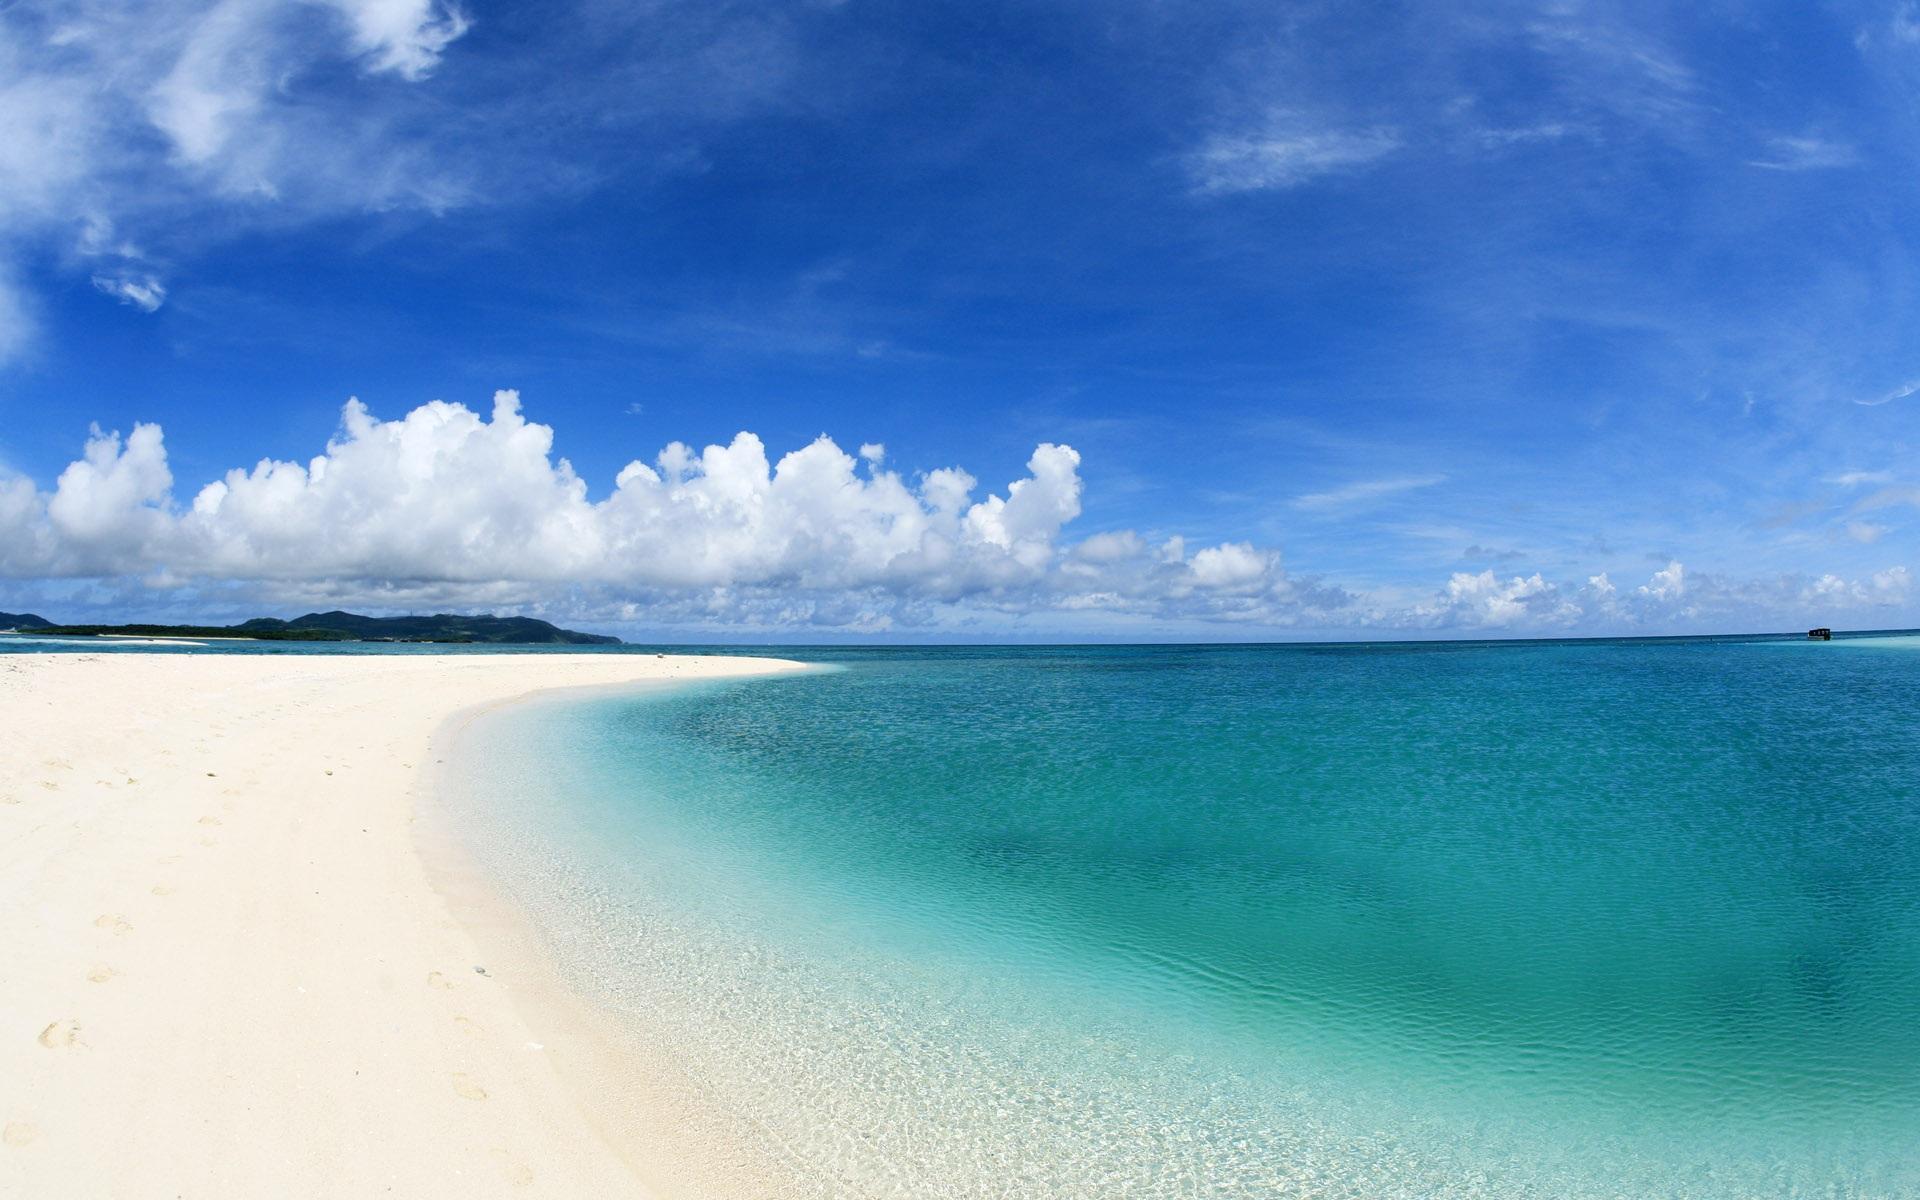 Beach-shoreline_1920x1200